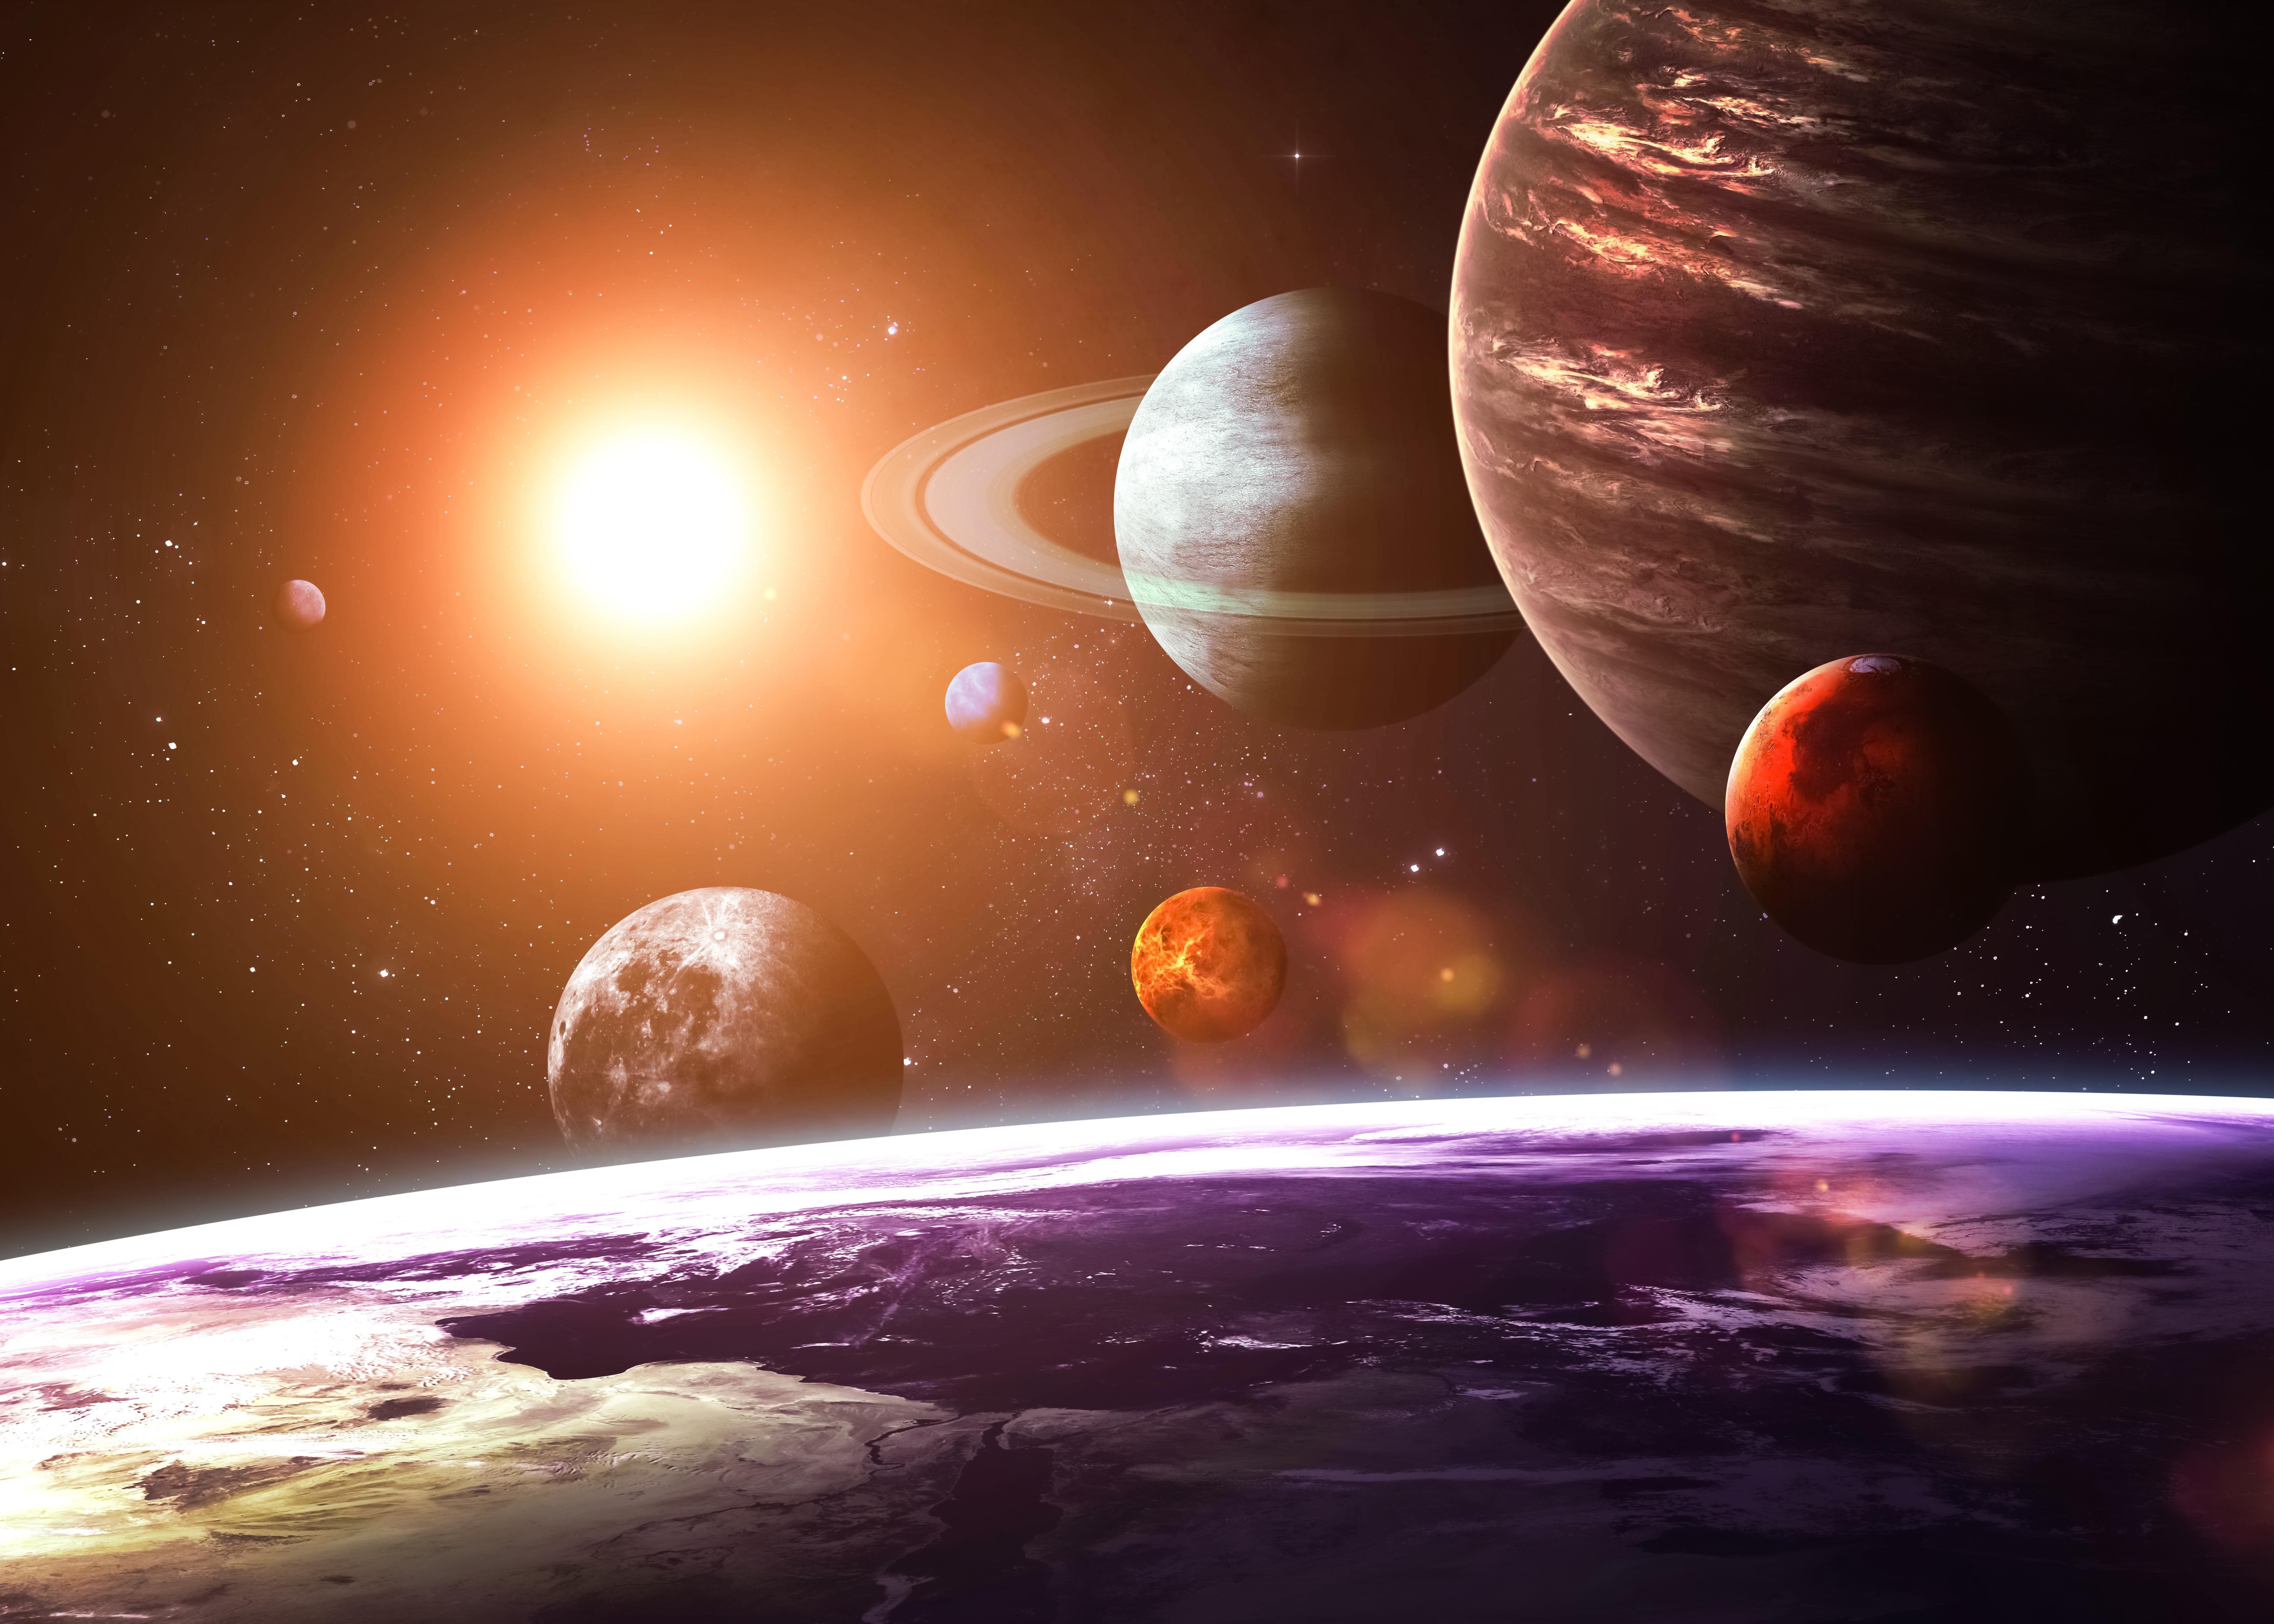 popoy-sidya-planeta-soeorasi-video-krasivih